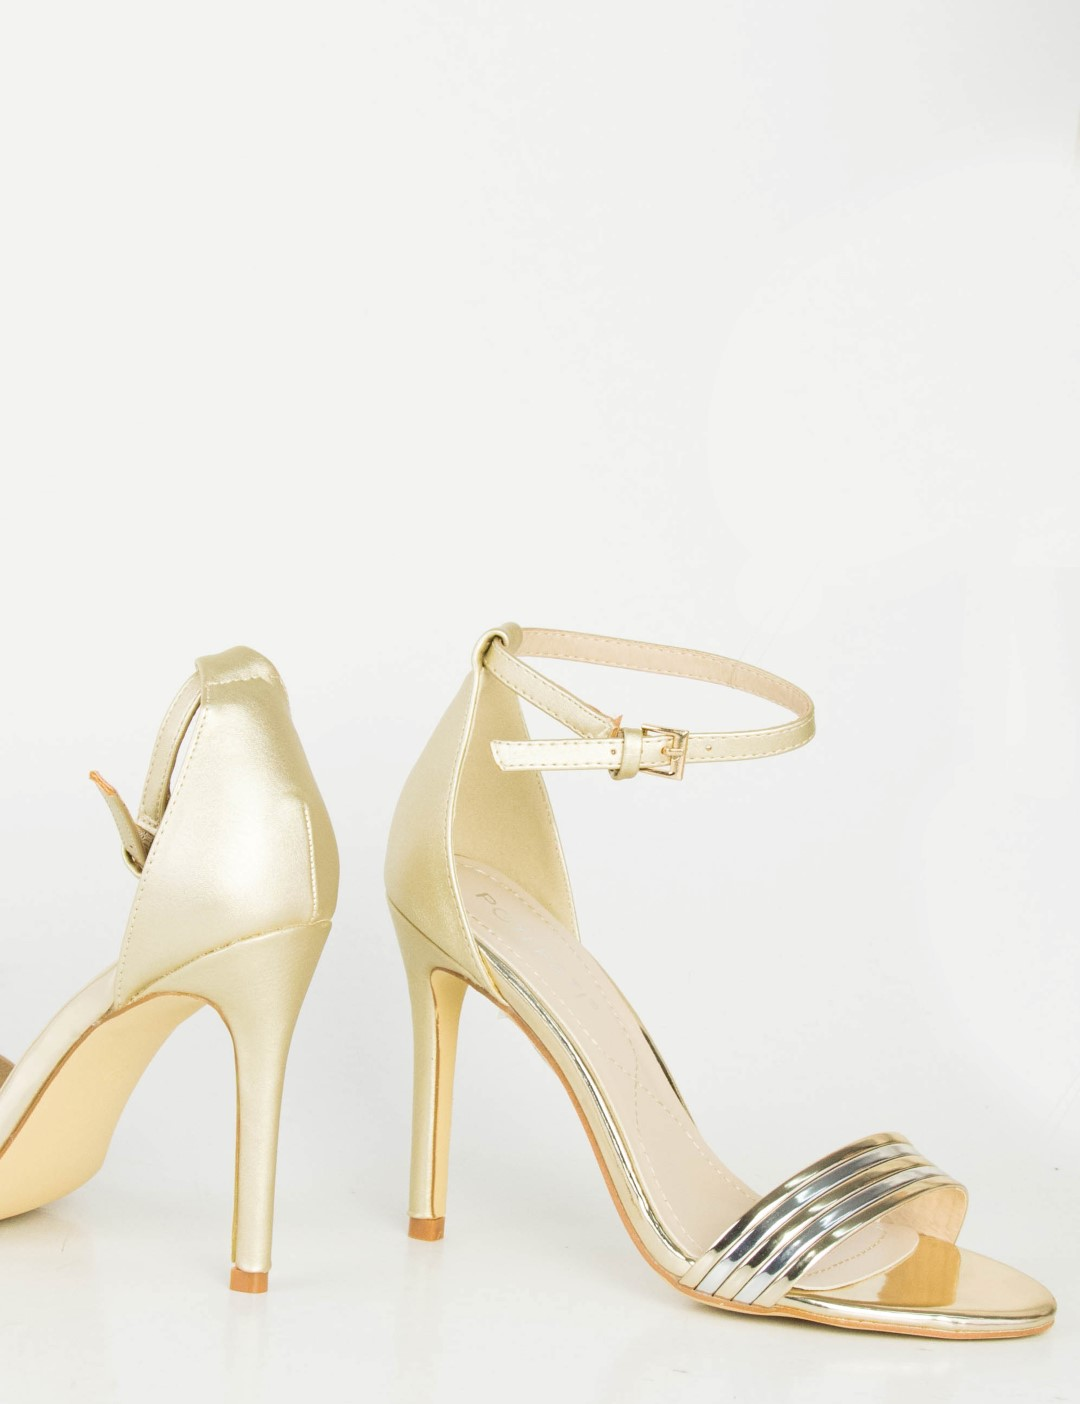 200cc896305 Γυναικεία χρυσά πέδιλα λεπτό τακούνι μπαρέτα PH089L